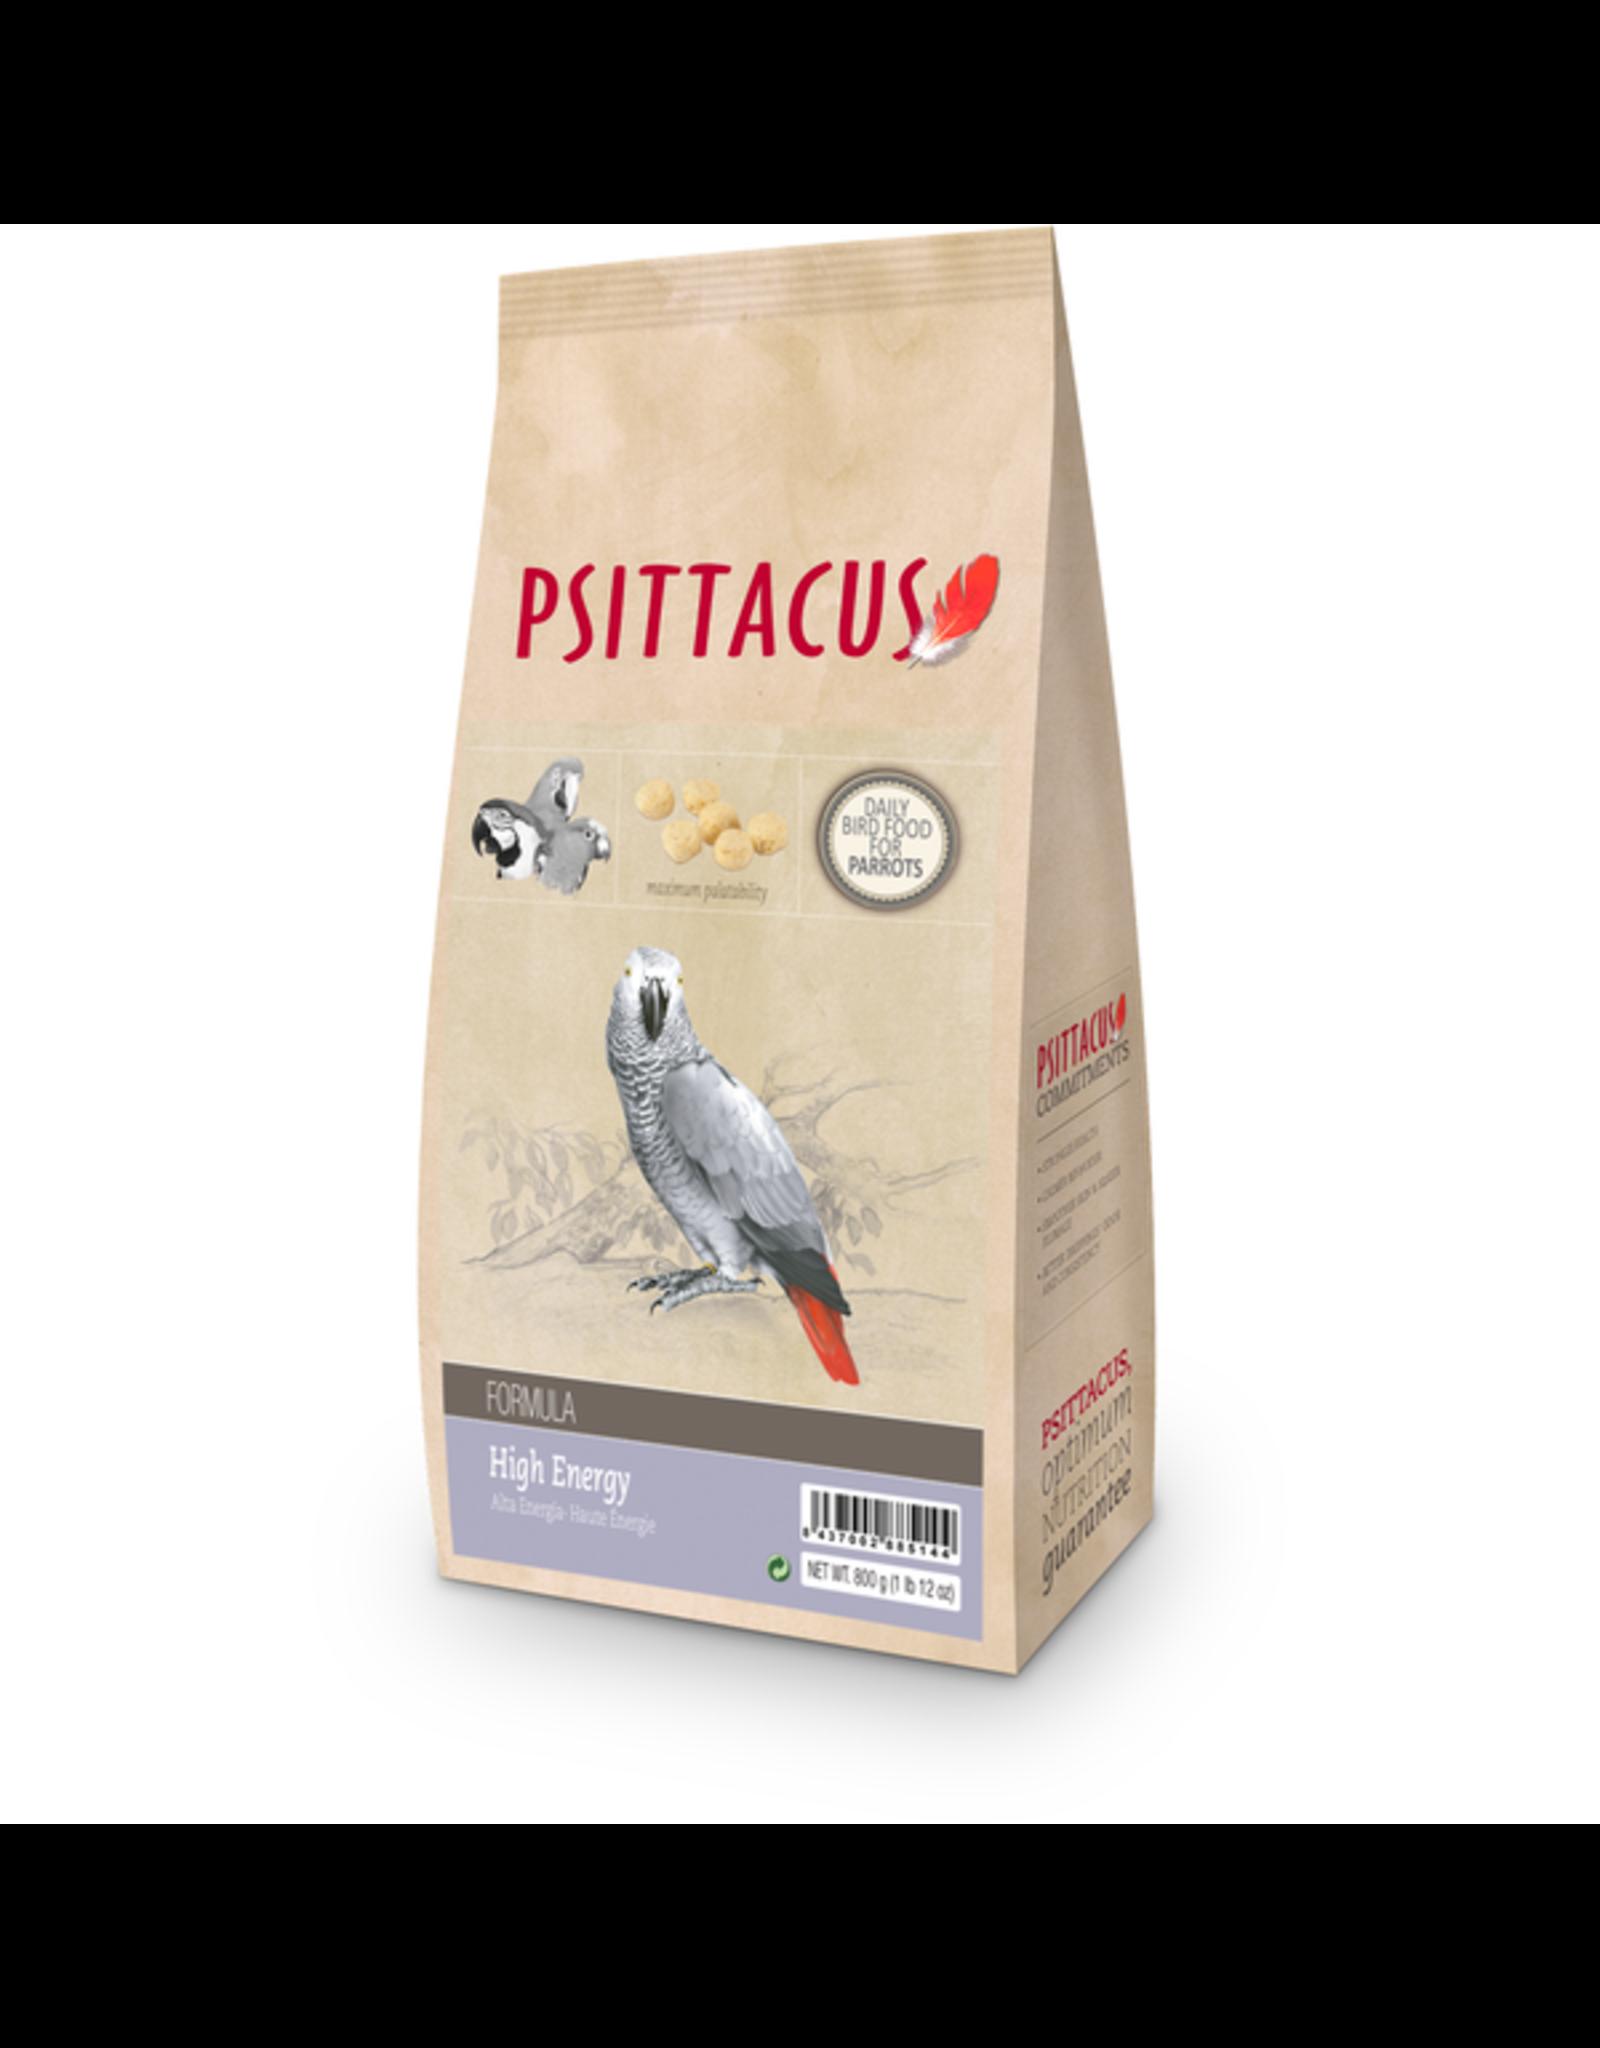 Psittacus maintenance HE formula 1lbs 12 oz